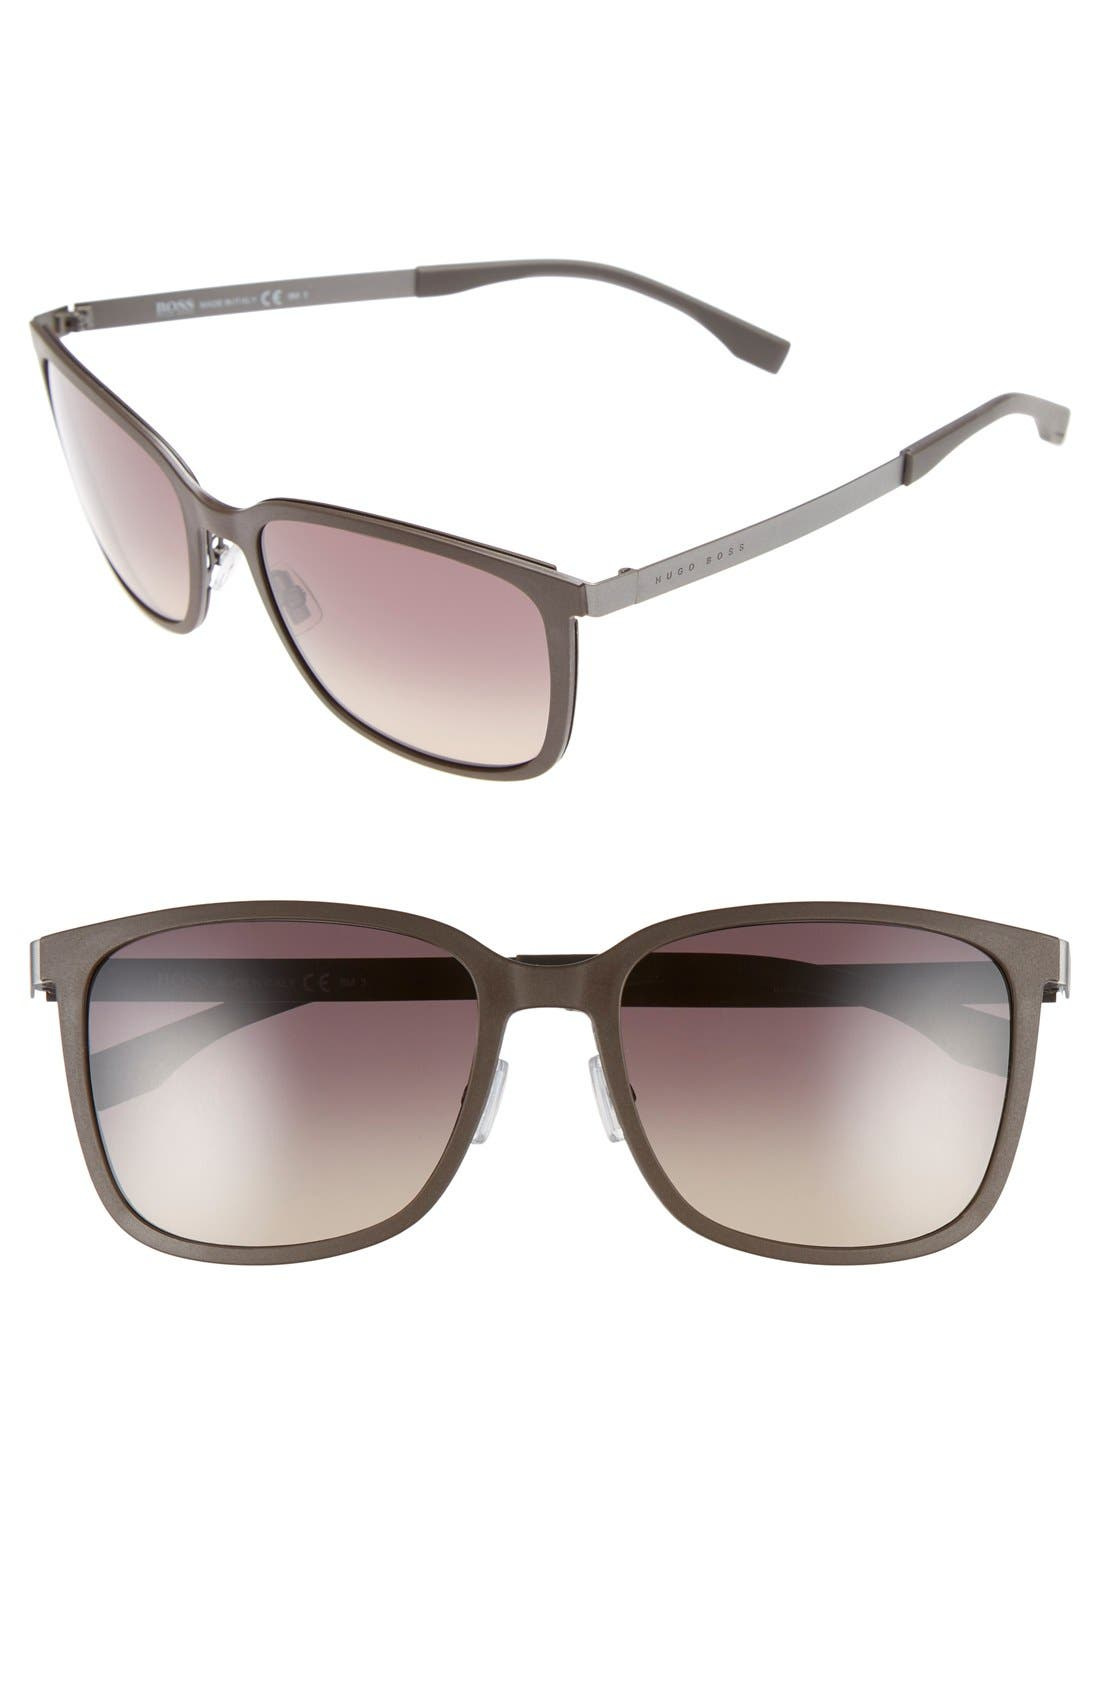 56mm Retro Sunglasses,                         Main,                         color, RUTHENIUM/GRAY/ GREEN GRADIENT